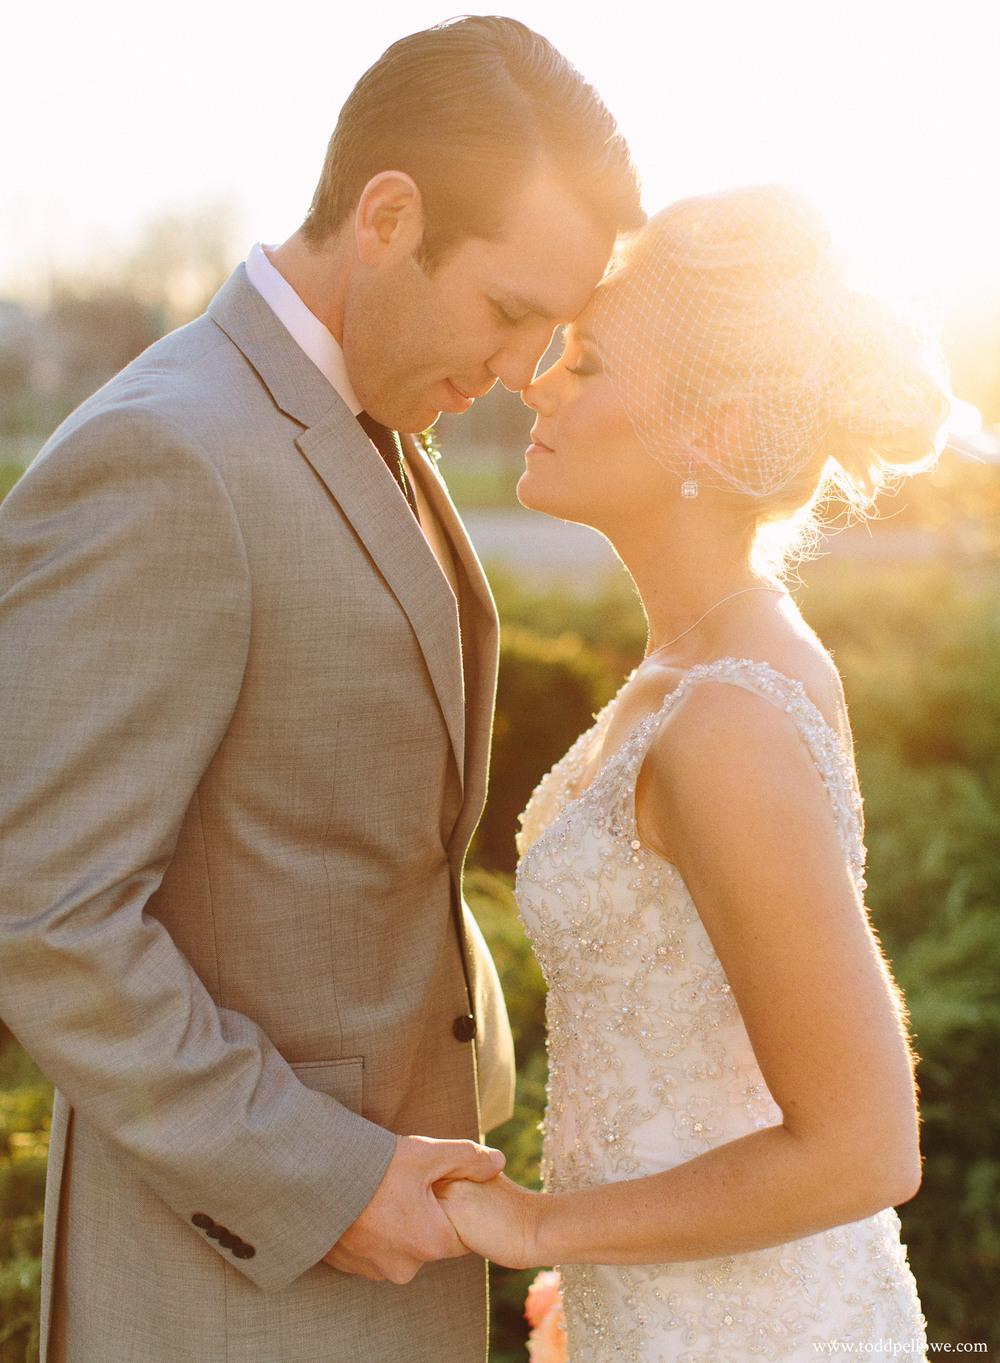 11-glassworks-wedding-photography-130.jpg